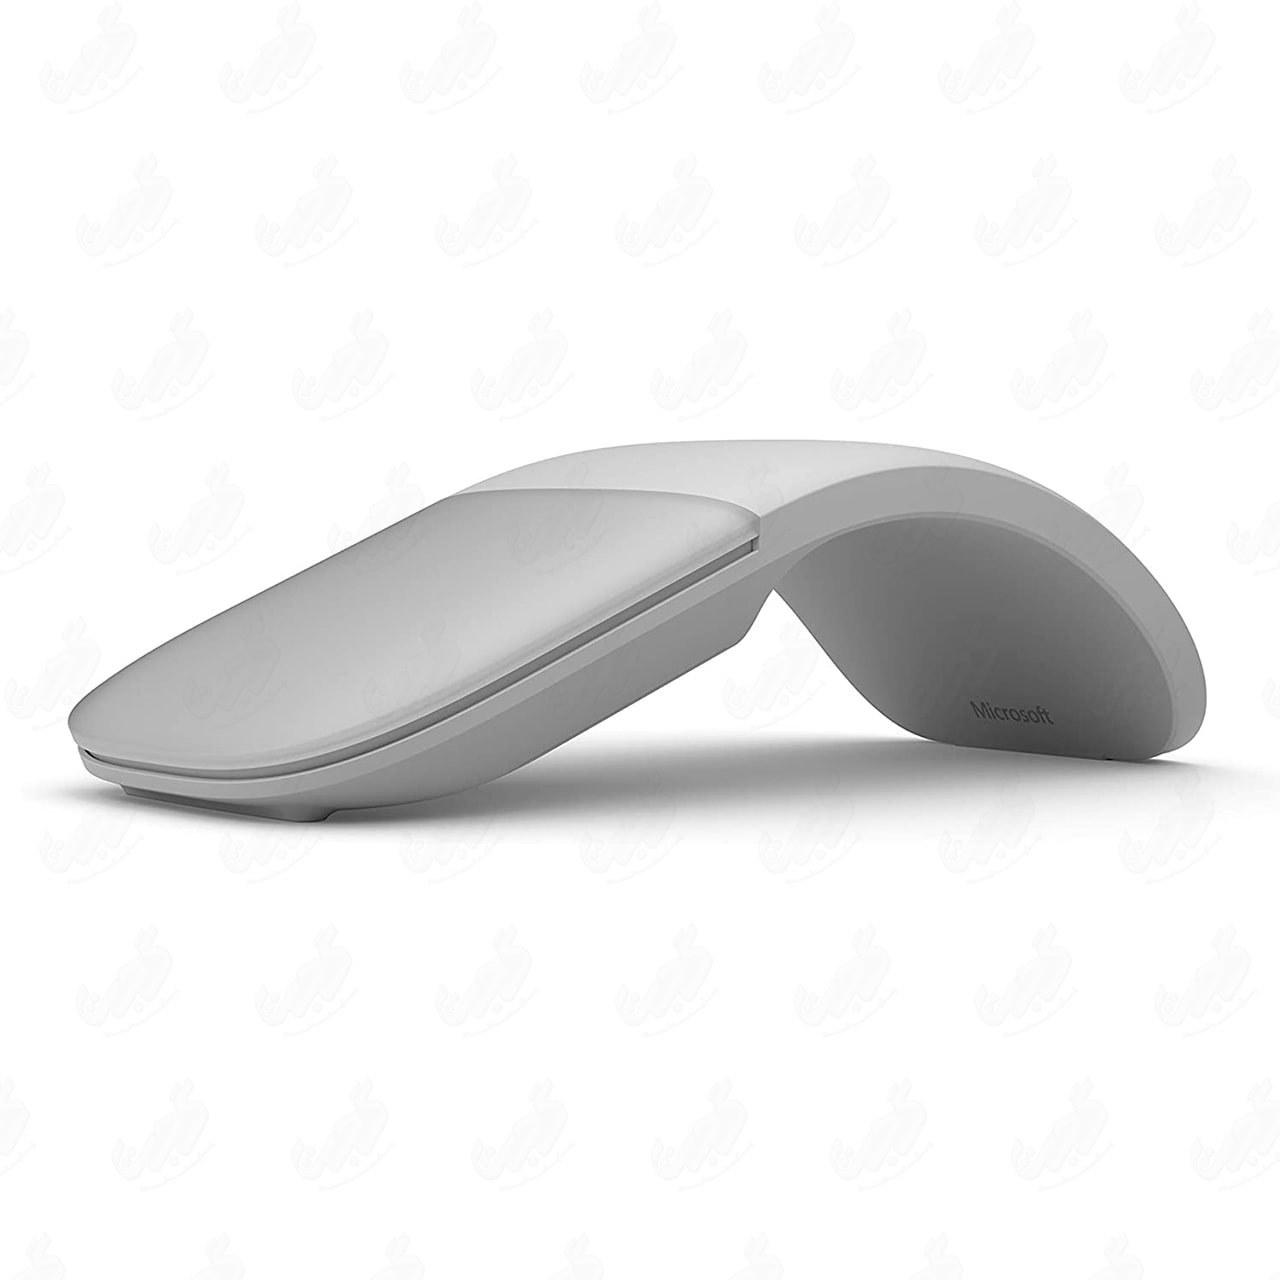 تصویر ماوس مایکروسافت مدل 2017 Surface Arc Microsoft Surface Arc 2017 Mouse